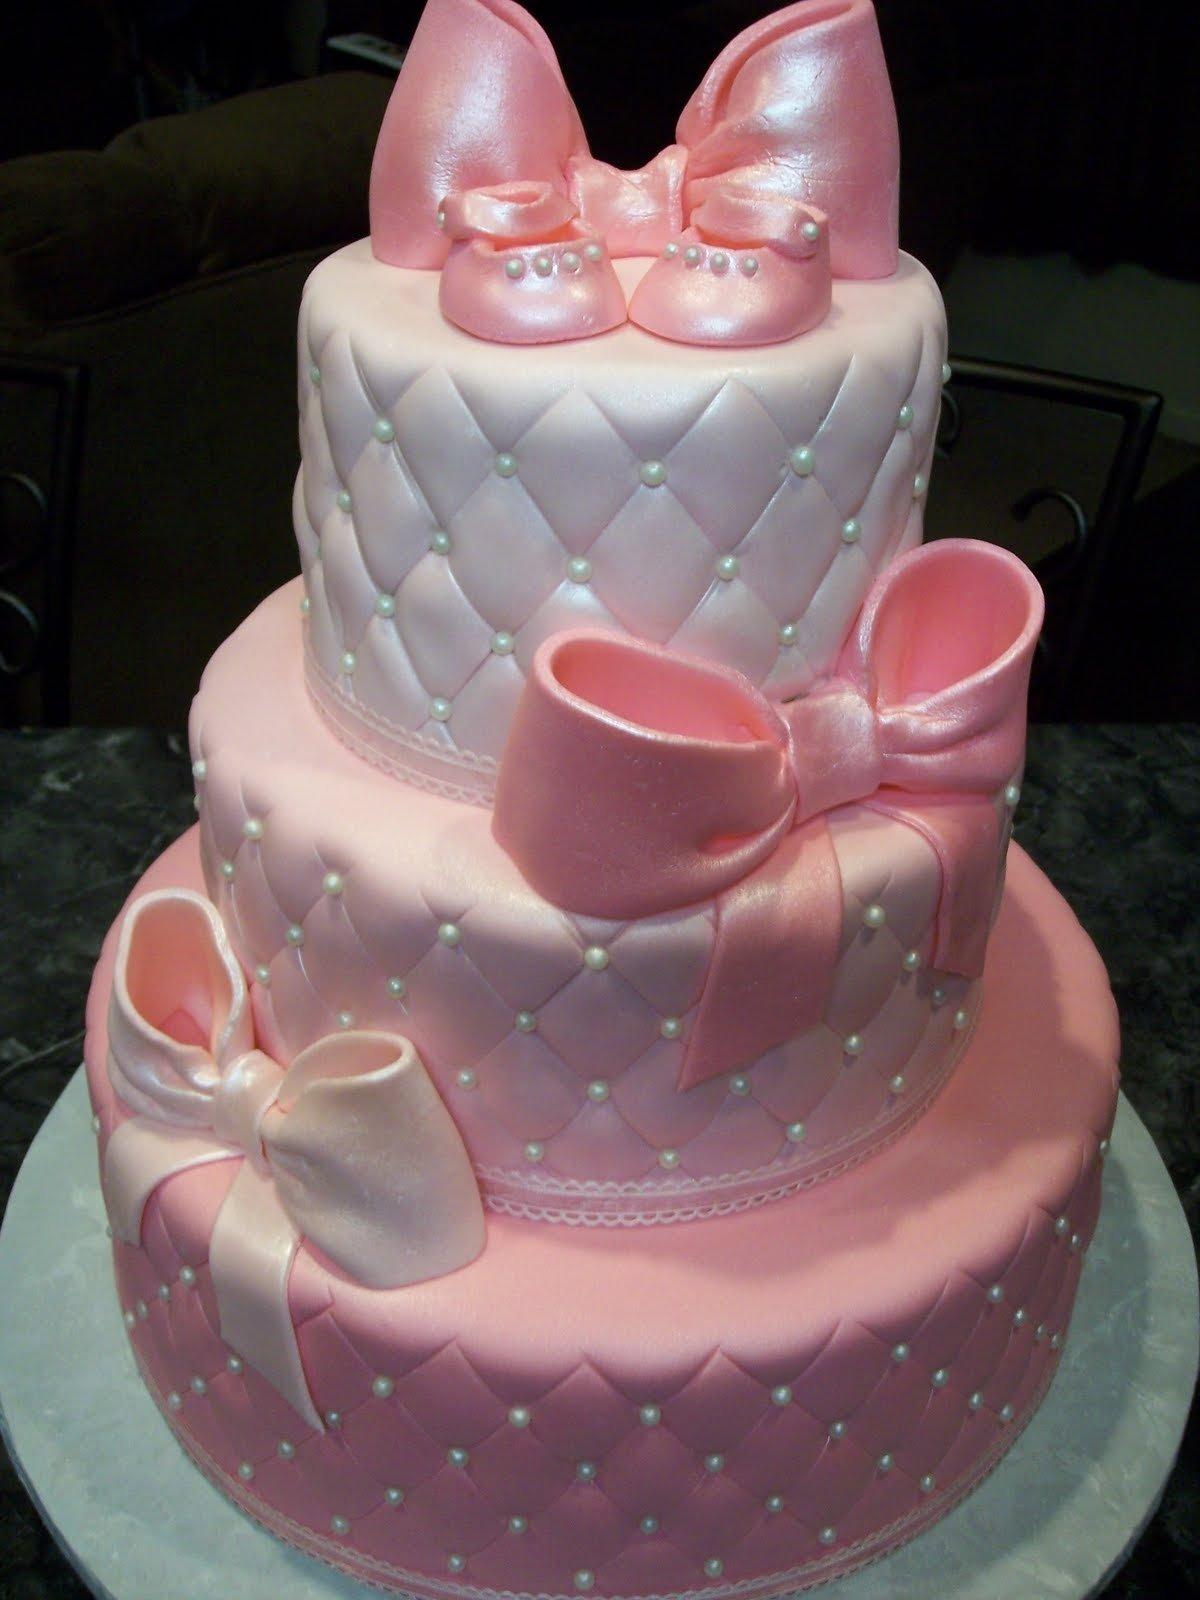 10 Perfect Baby Girl Shower Cake Ideas girl baby shower cakes and cupcakes ideas baby cake imagesbaby 3 2020